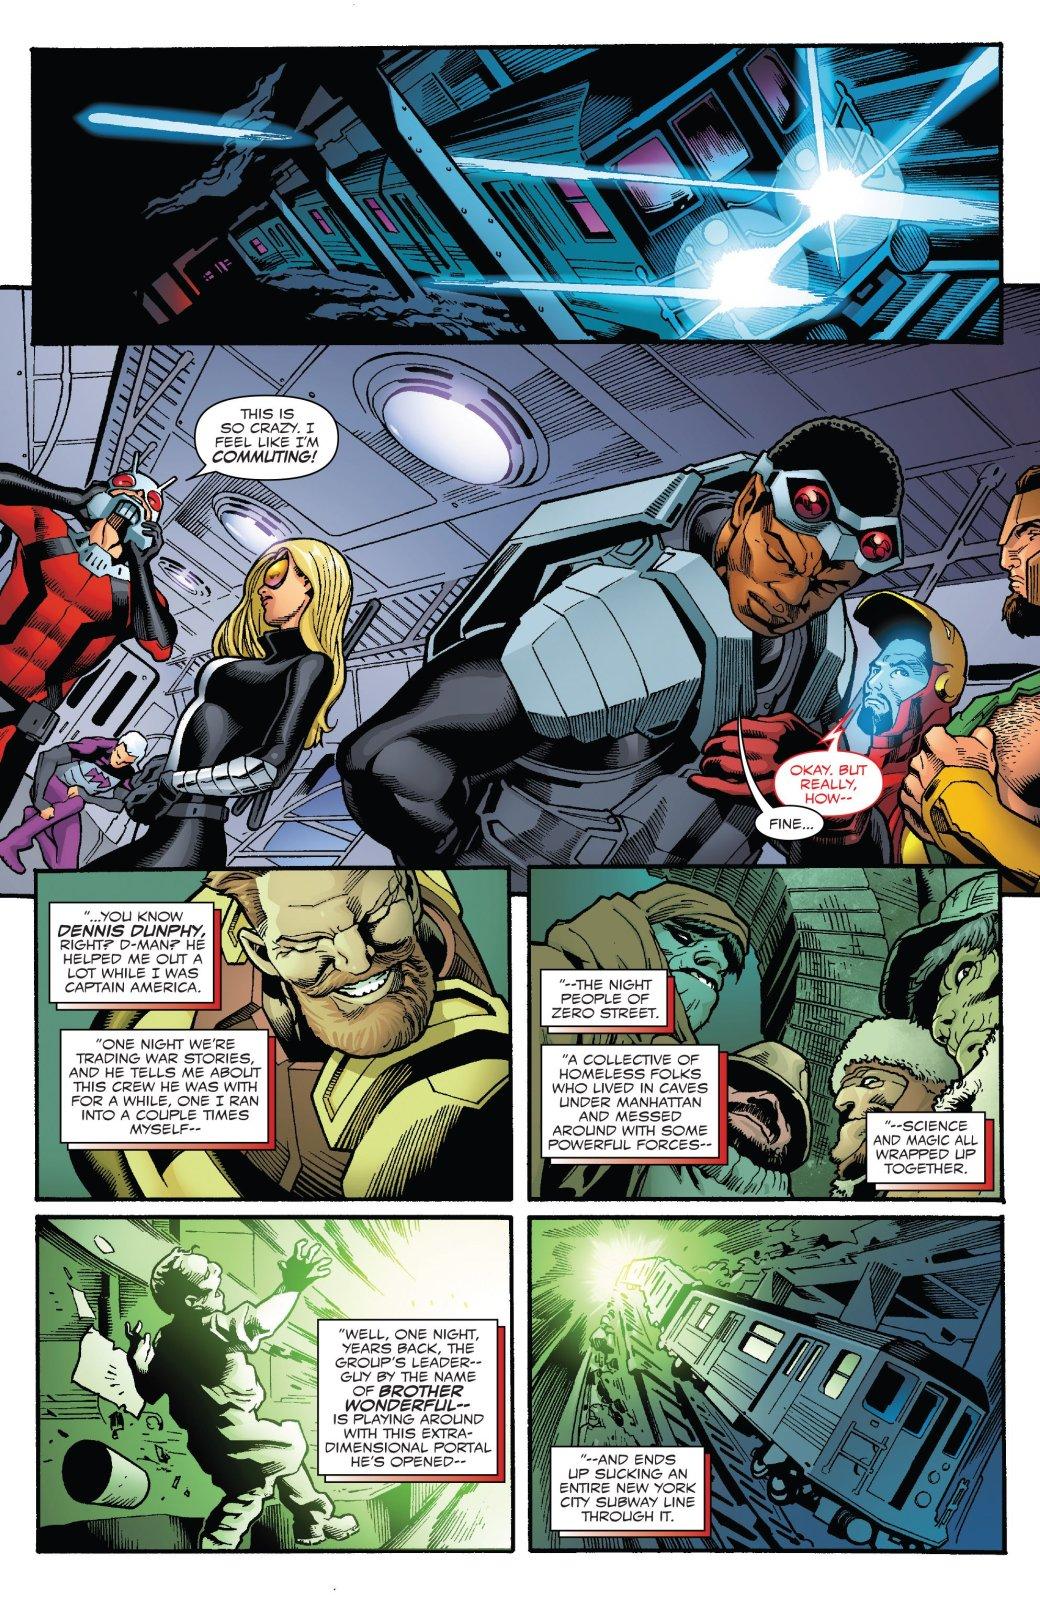 Secret Empire: противостоянию Стива Роджерса иТони Старка нет конца - Изображение 14